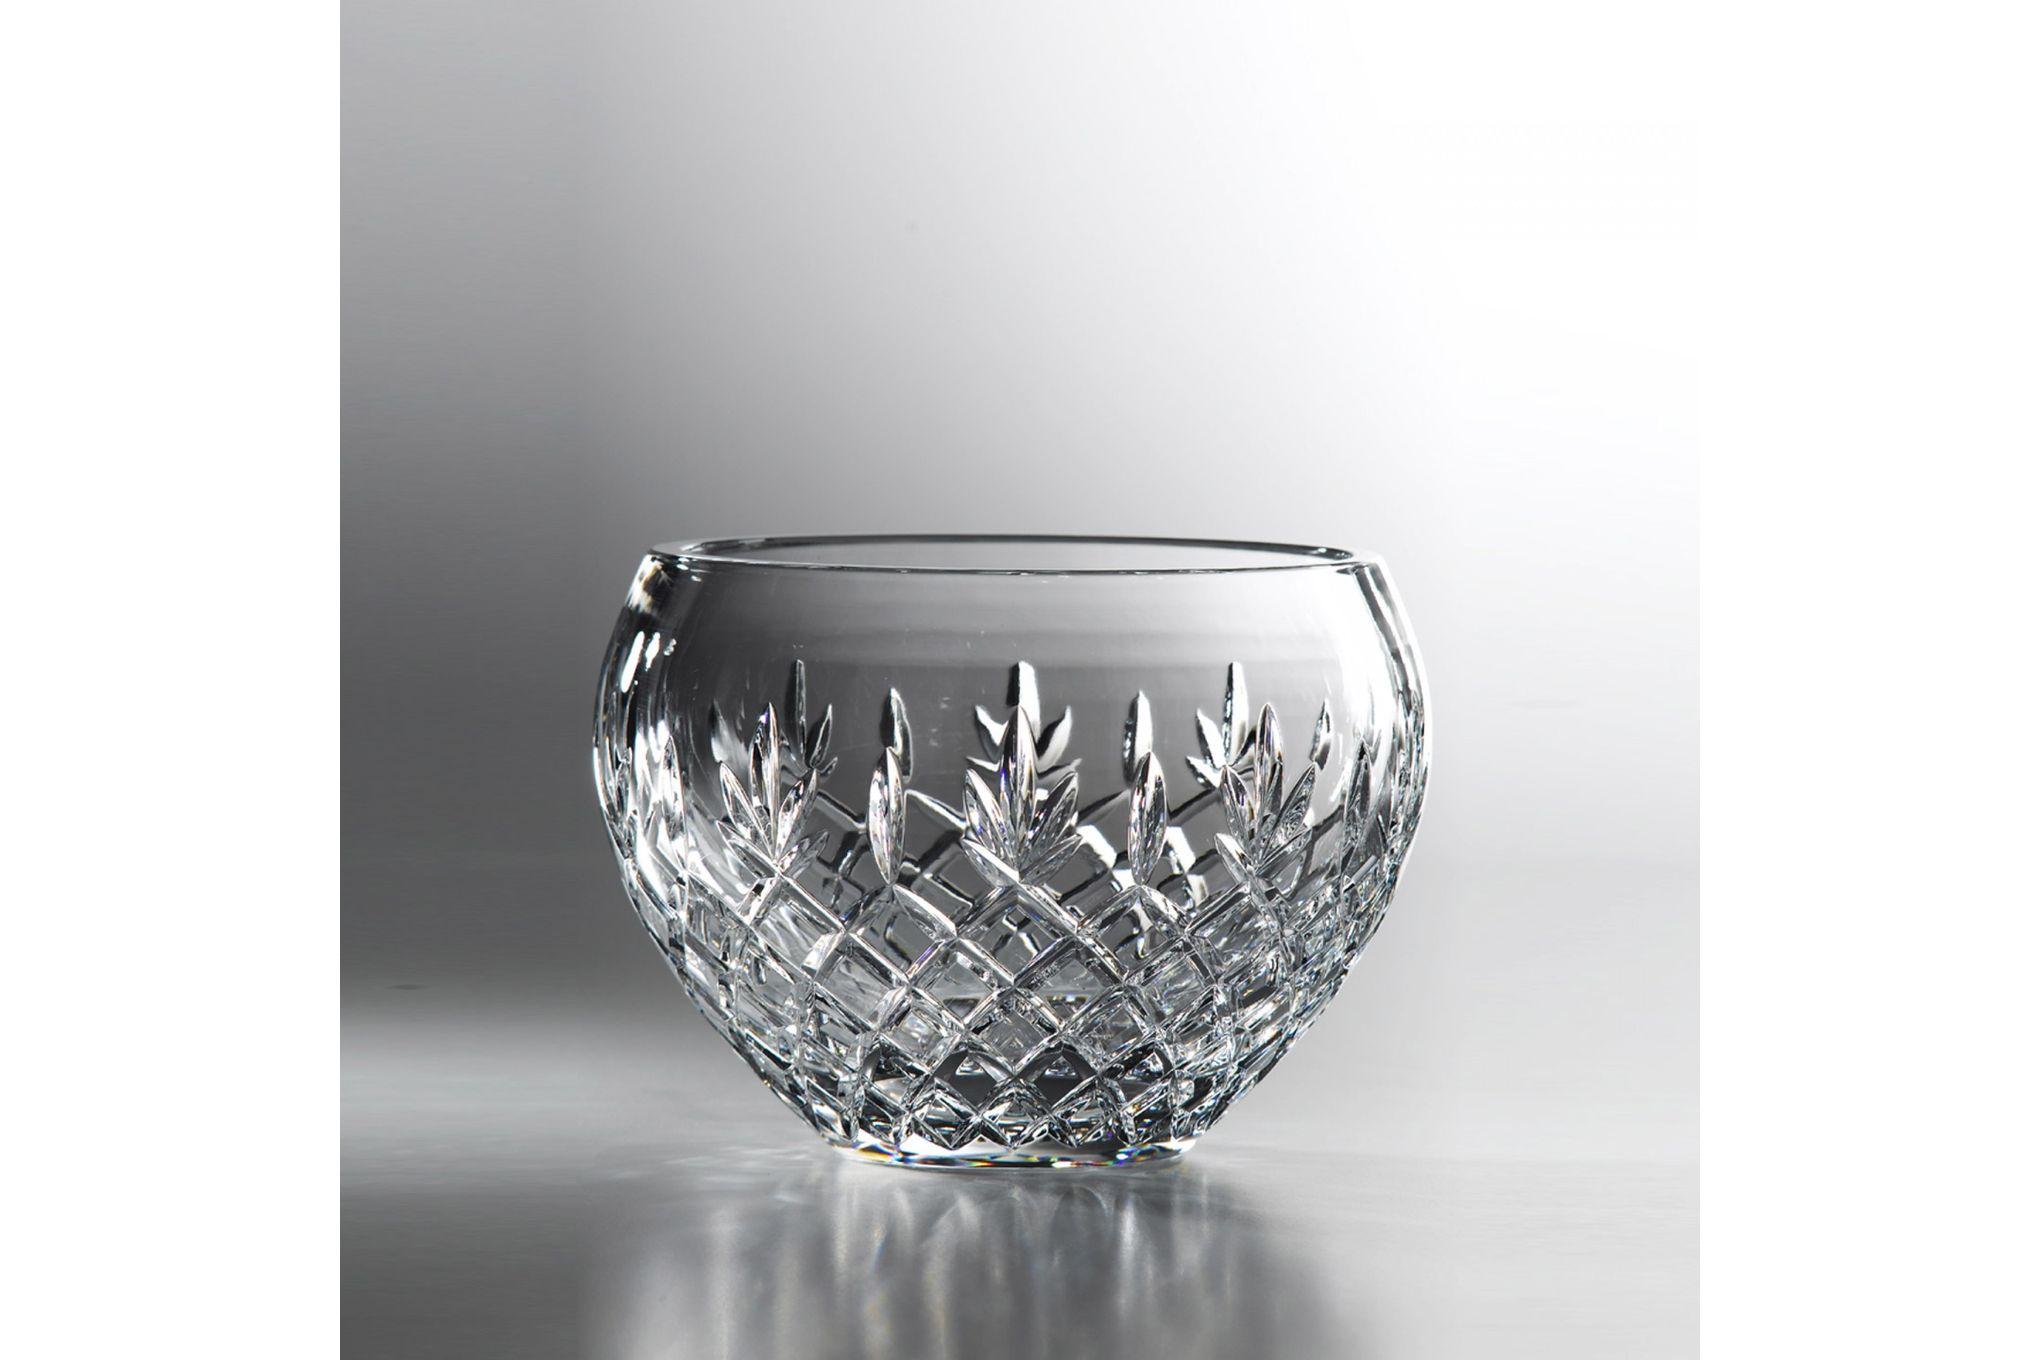 Royal Doulton Dorchester Glass Bowl Boxed - Deep 21cm thumb 2